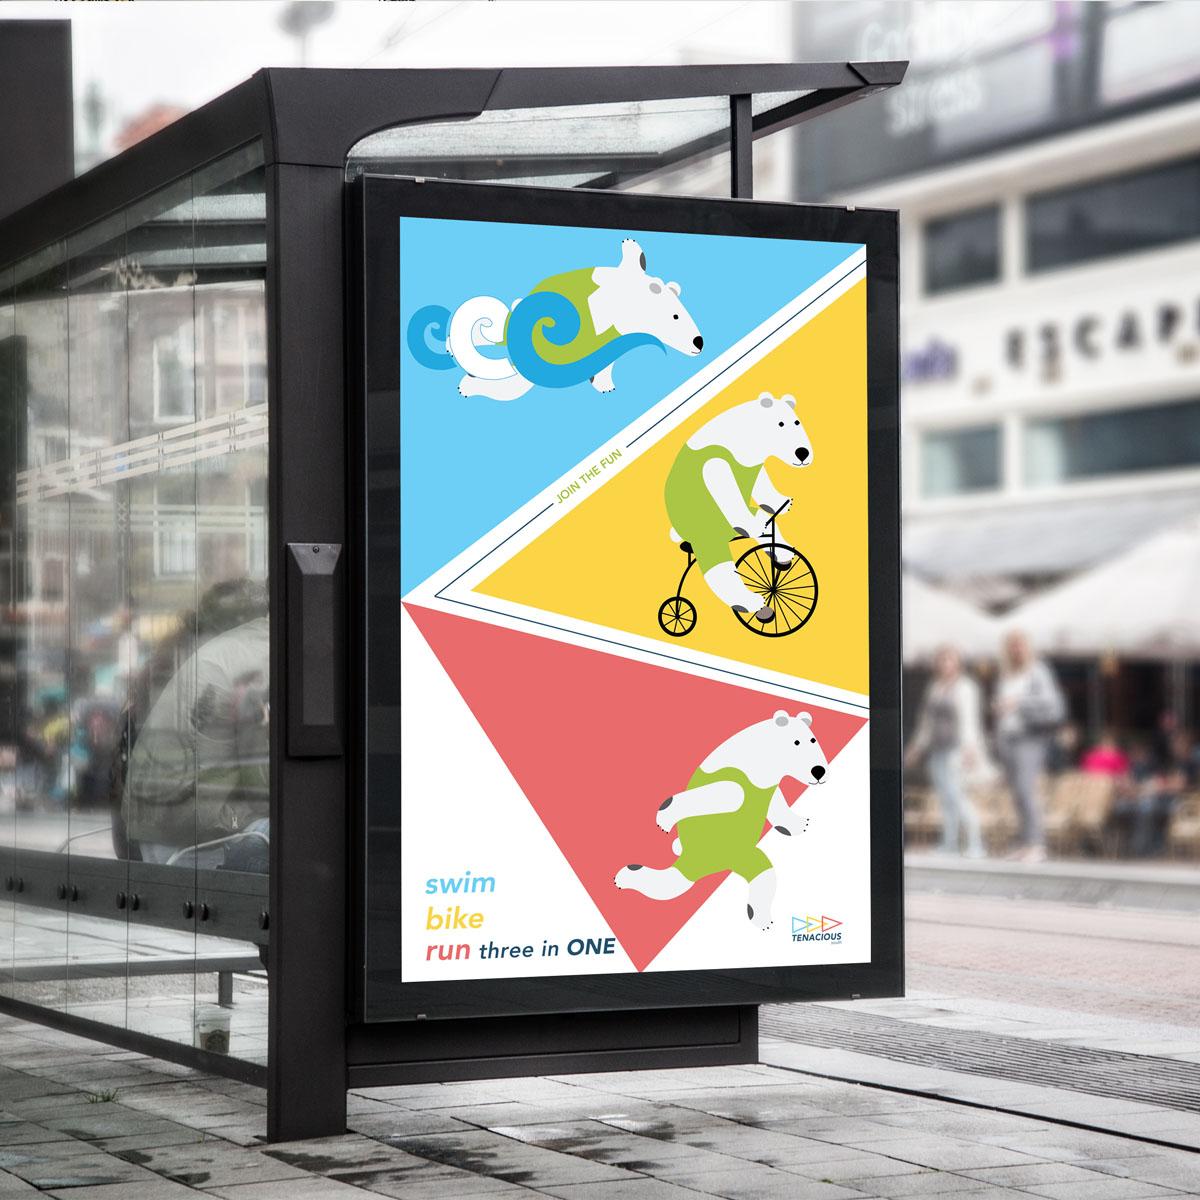 service-ads.jpg